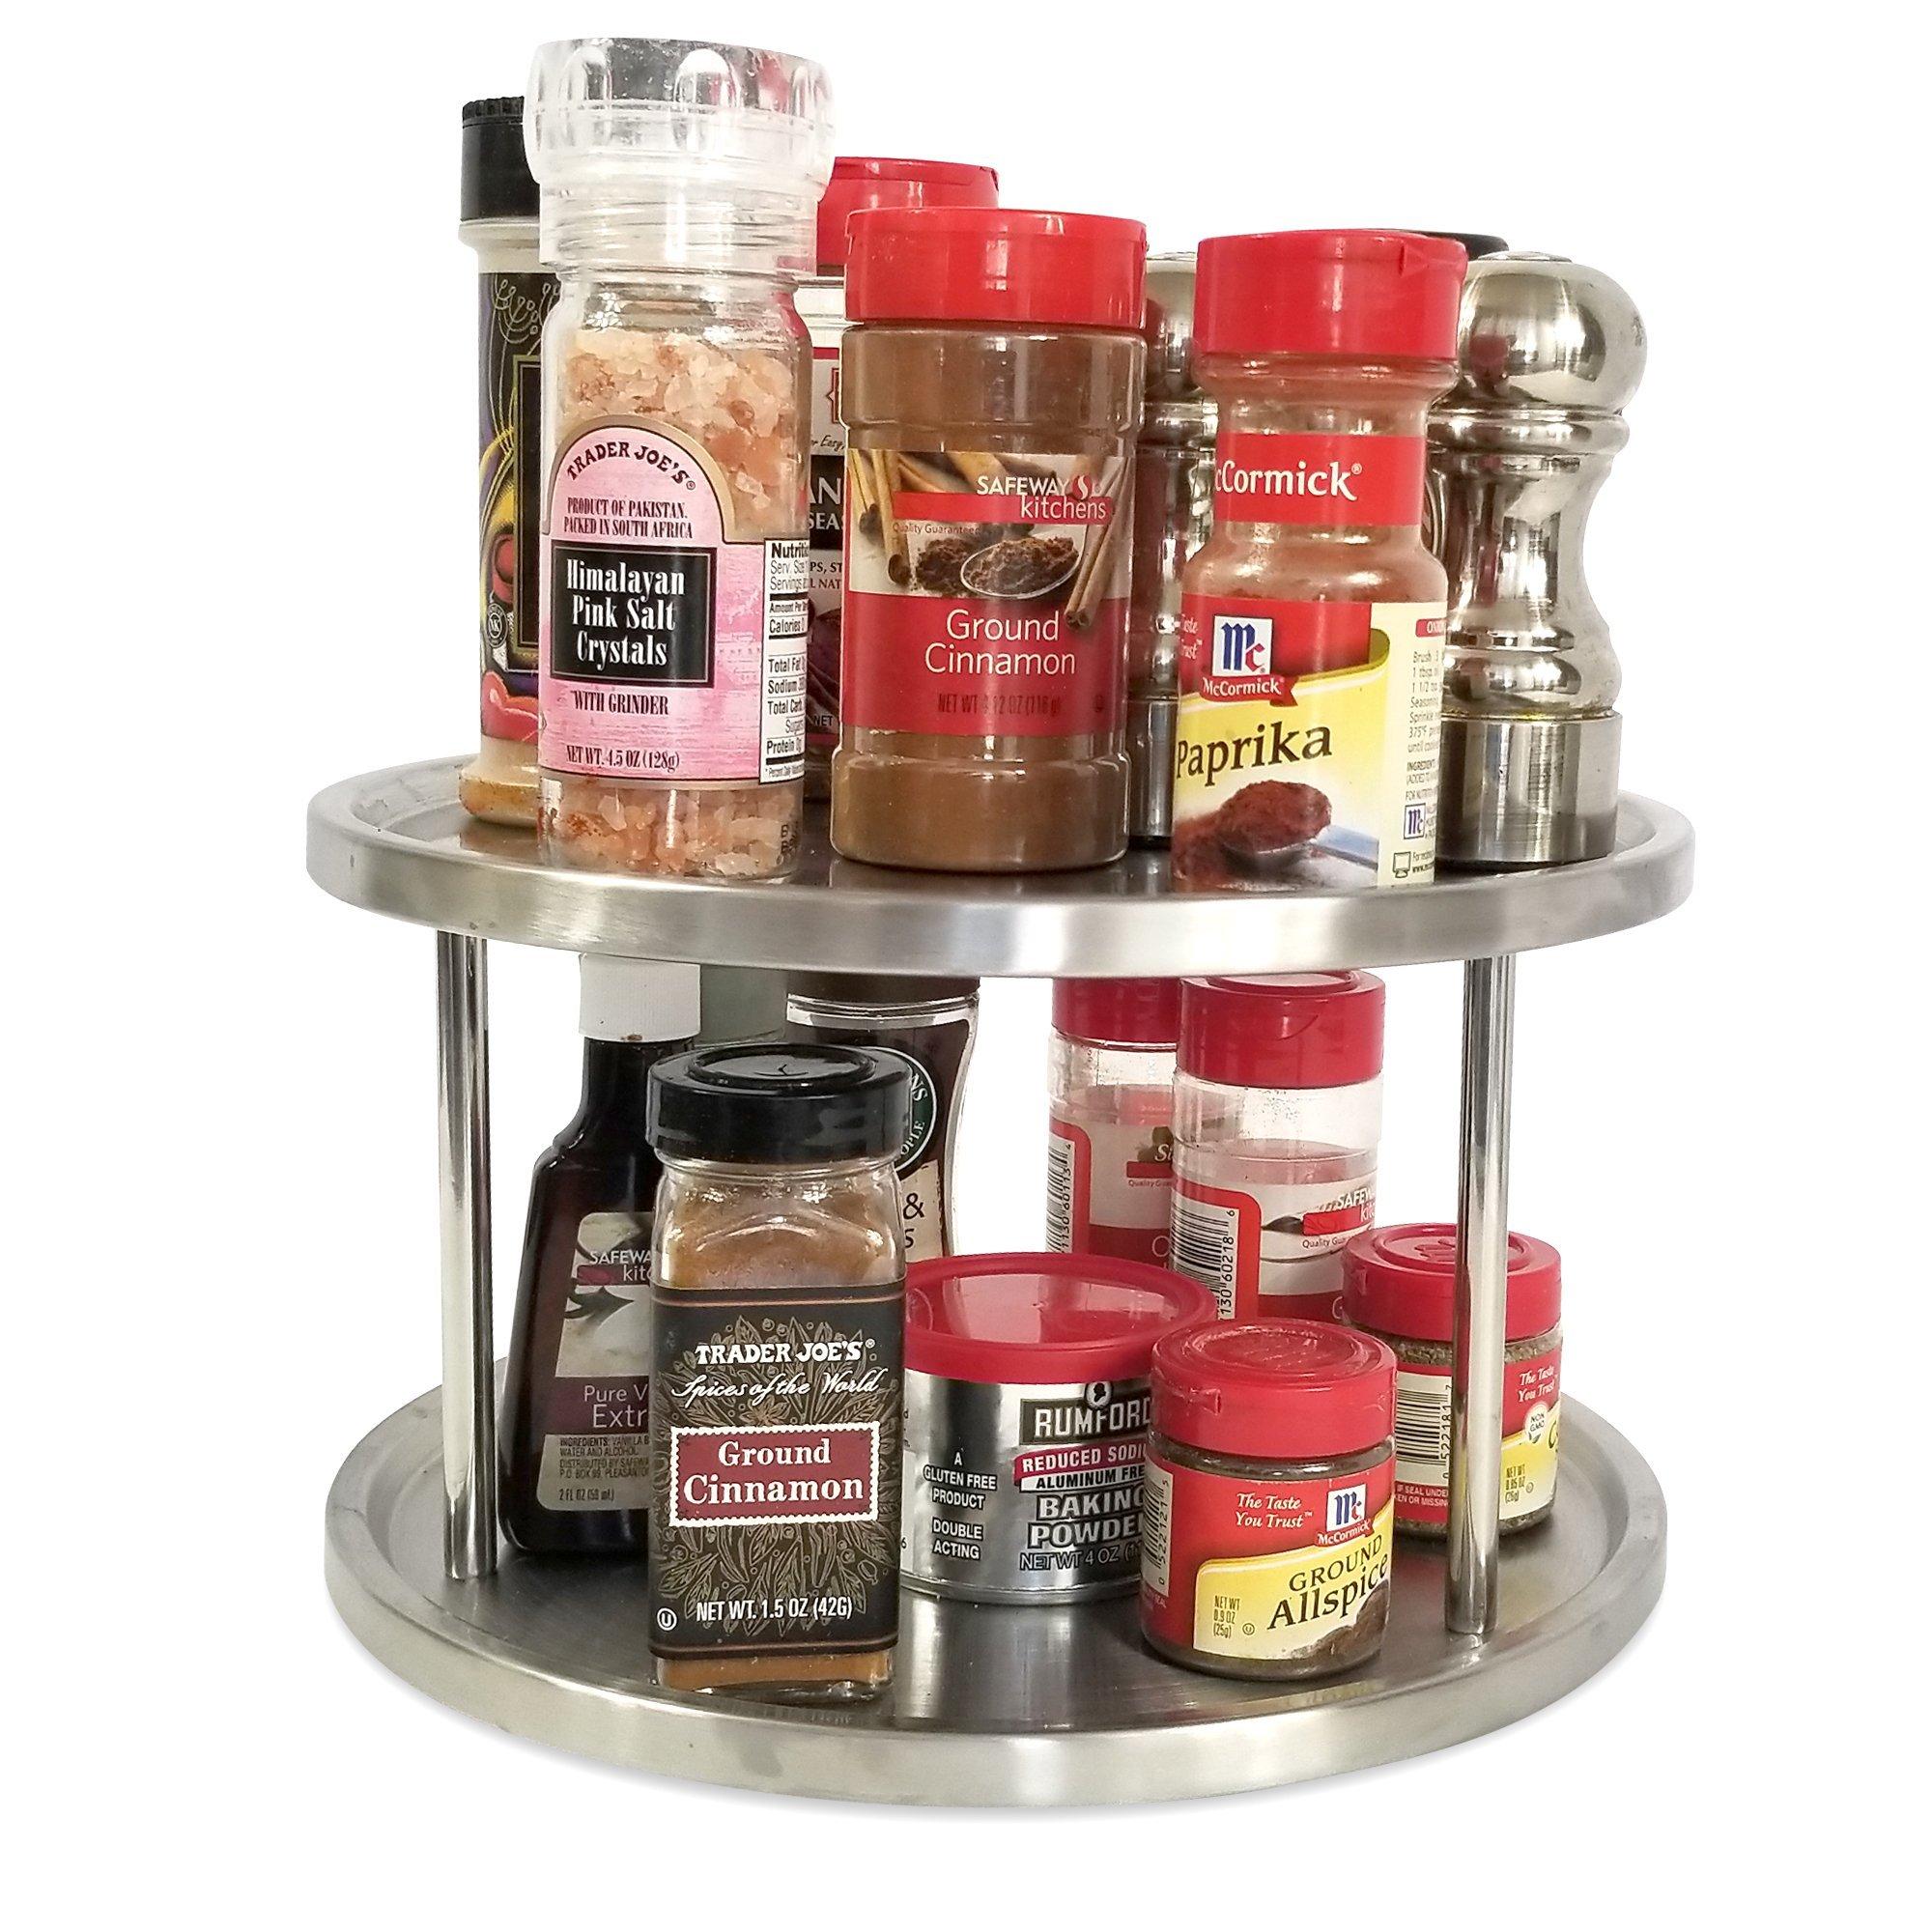 Lazy Susan Turntable 10 in Acacia Wood 2-Tier Kitchen Organizer Spice Storage